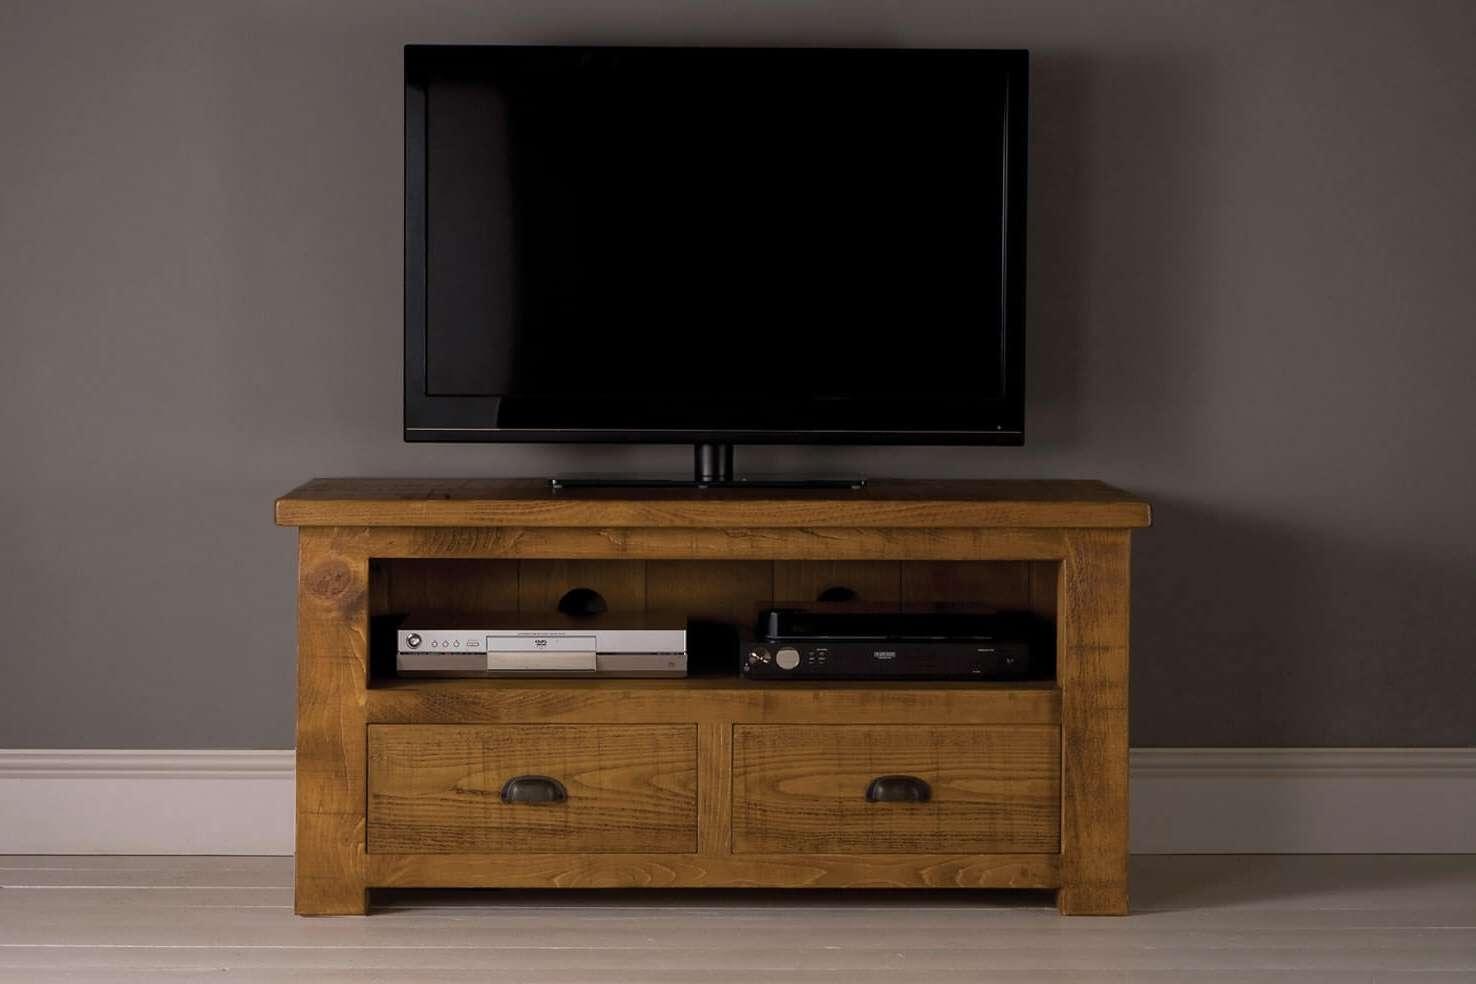 Grand Plank Tv Cabinet With Drawersindigo Furniture With Regard To Tv Cabinets With Drawers (View 9 of 20)